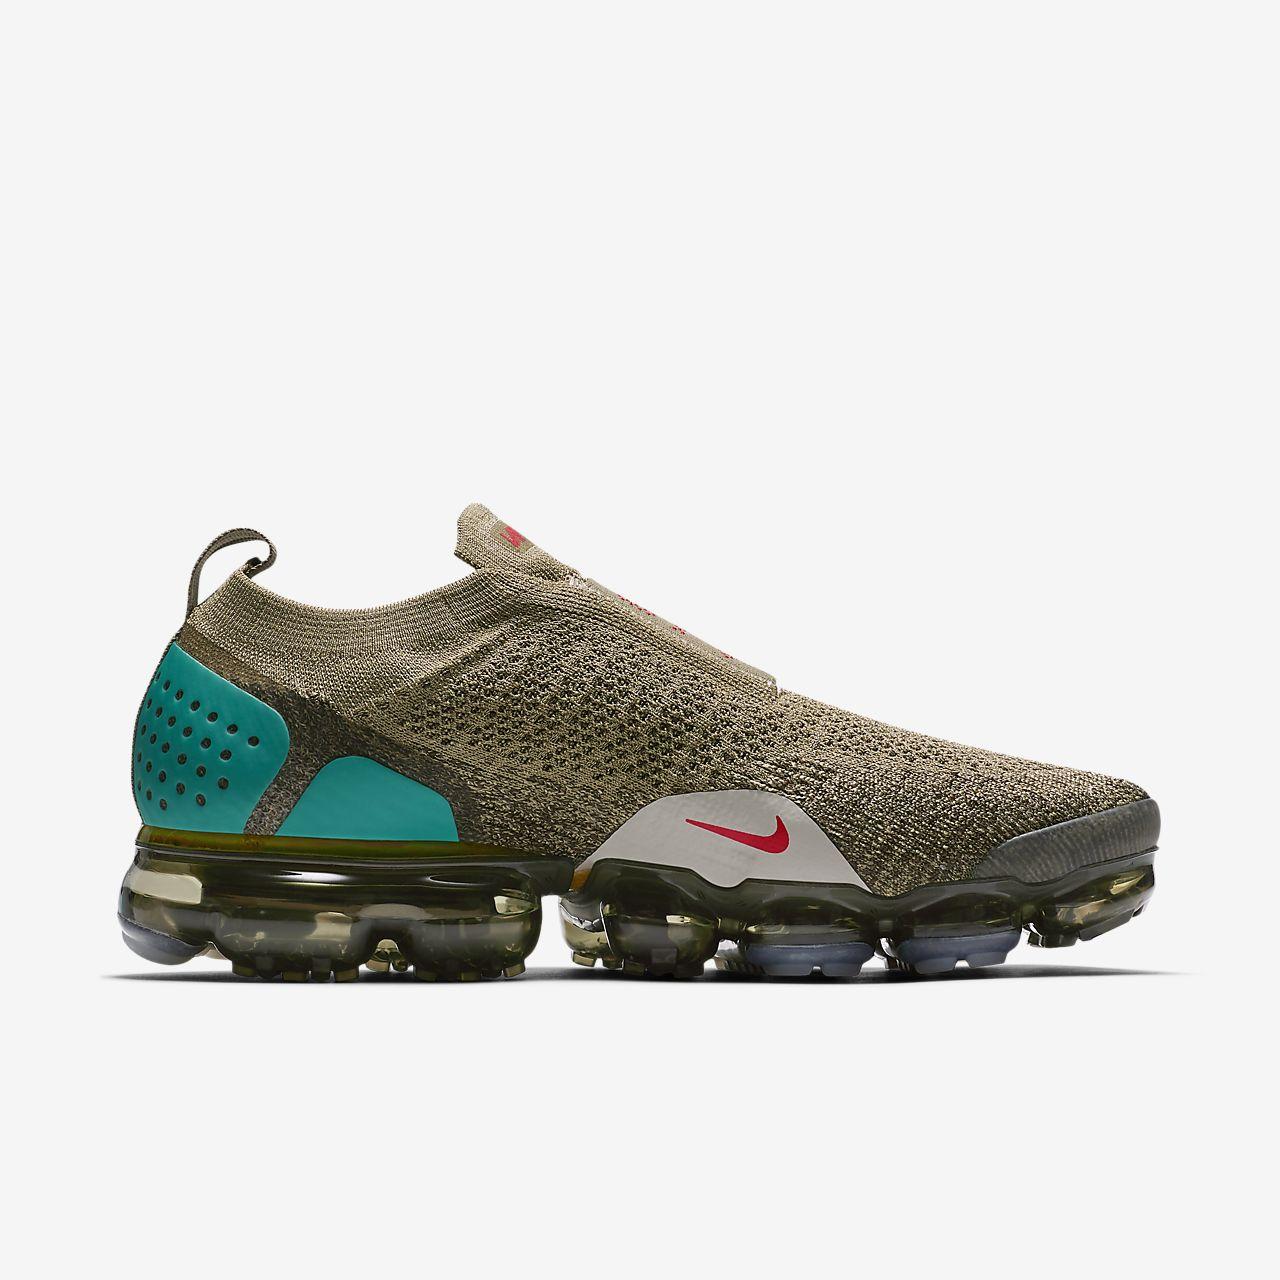 Chaussures Nike Avenir Olive jGFvz